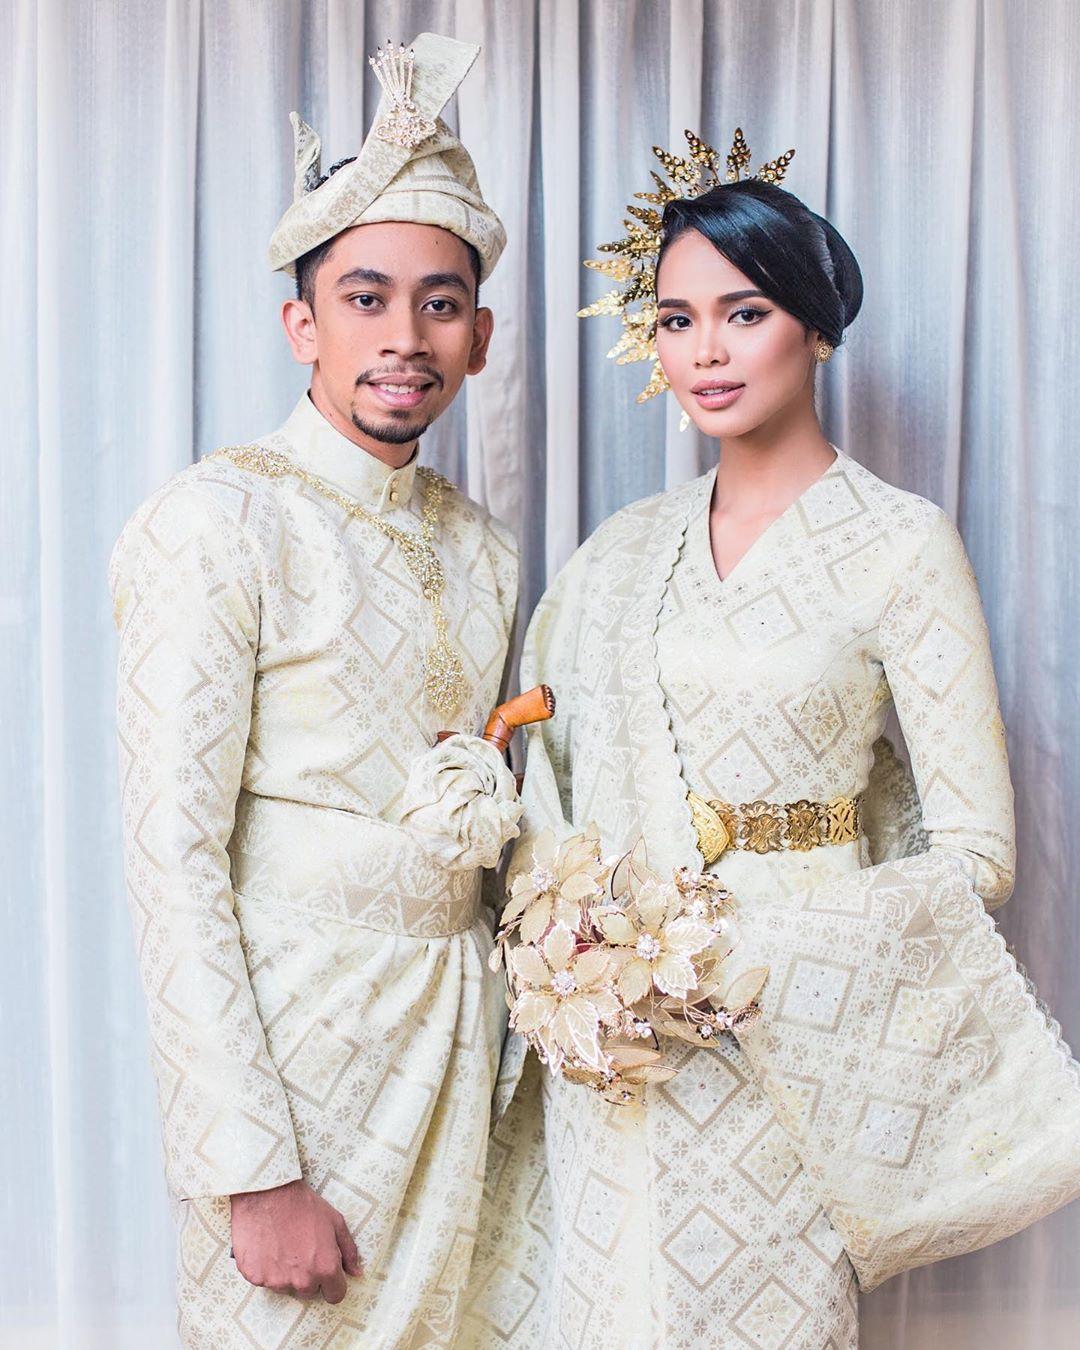 [FOTO] Tema 'Melayu Klasik' Ain Edruce Cukup Mempesona, Janna Nick Pun Puji